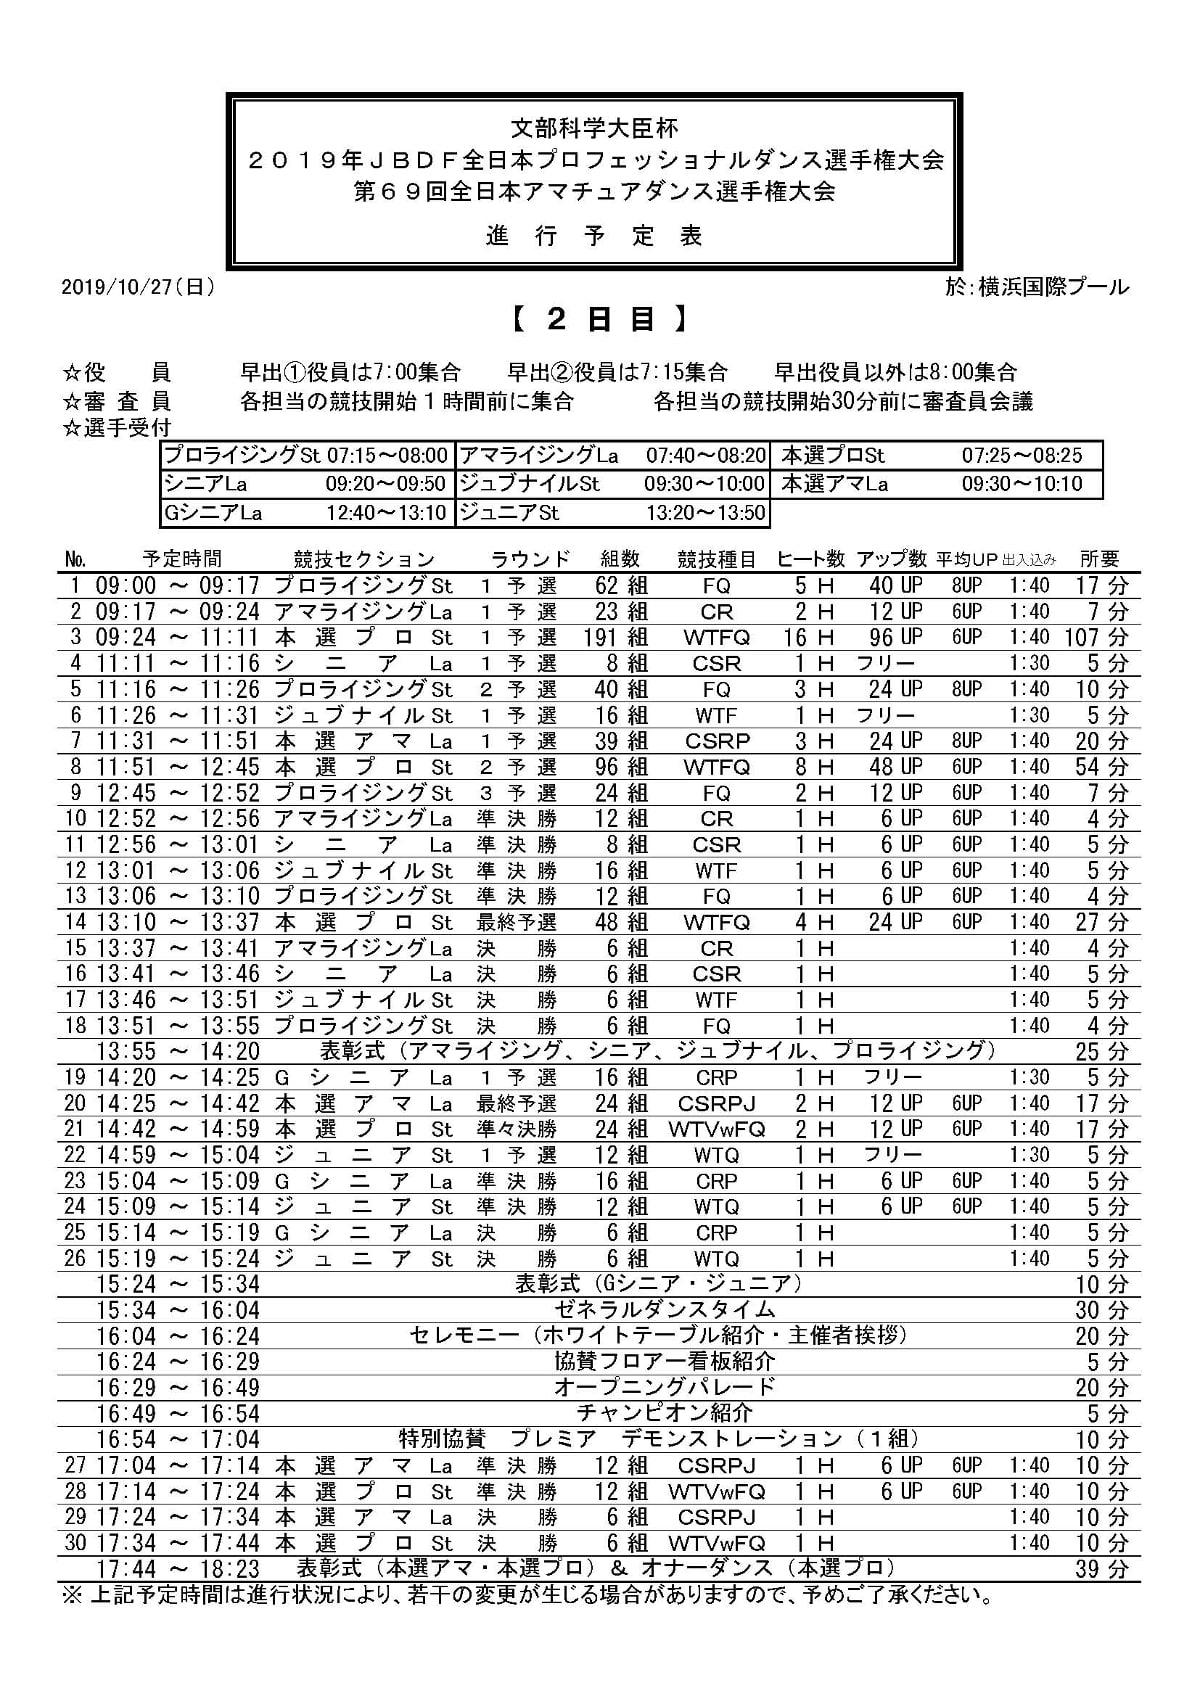 6b11e79a15fdf2f0c73f20419d559d2e088c2cc8_ページ_2